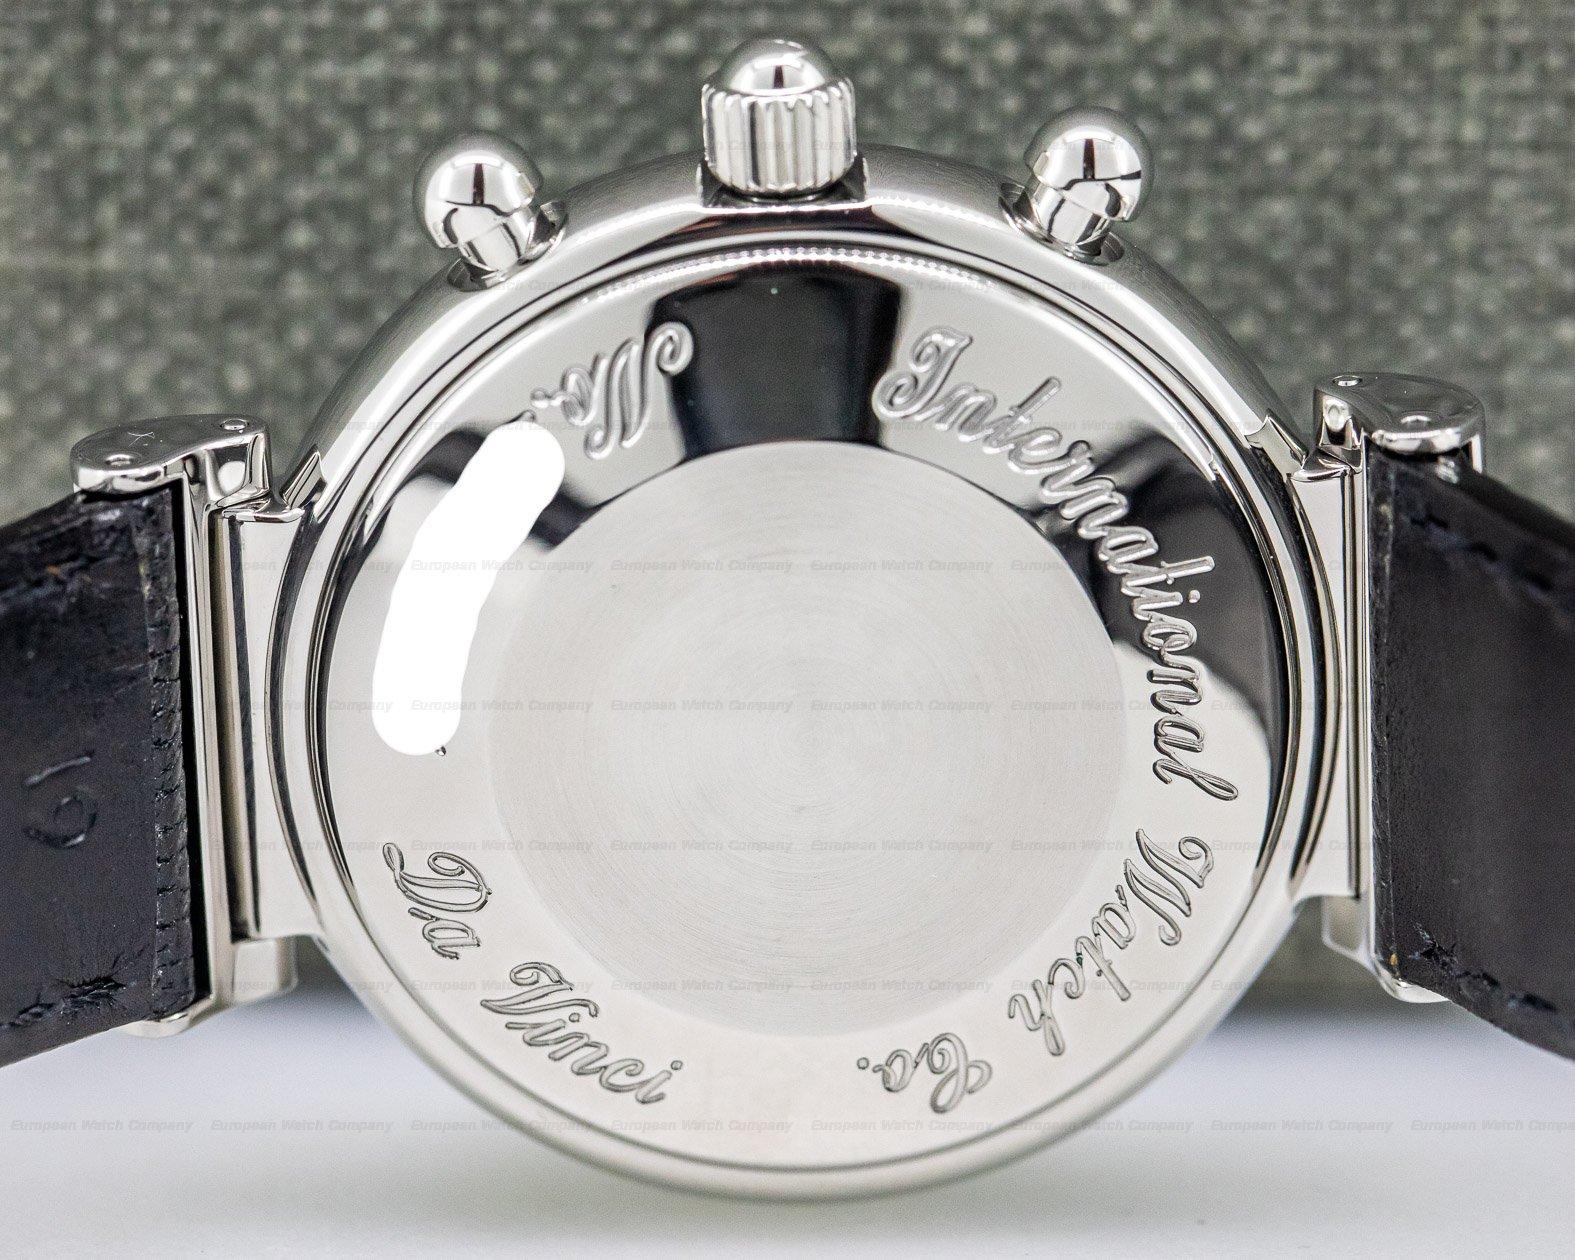 IWC IW375030 Da Vinci Perpetual Chronograph Black SS / Alligator